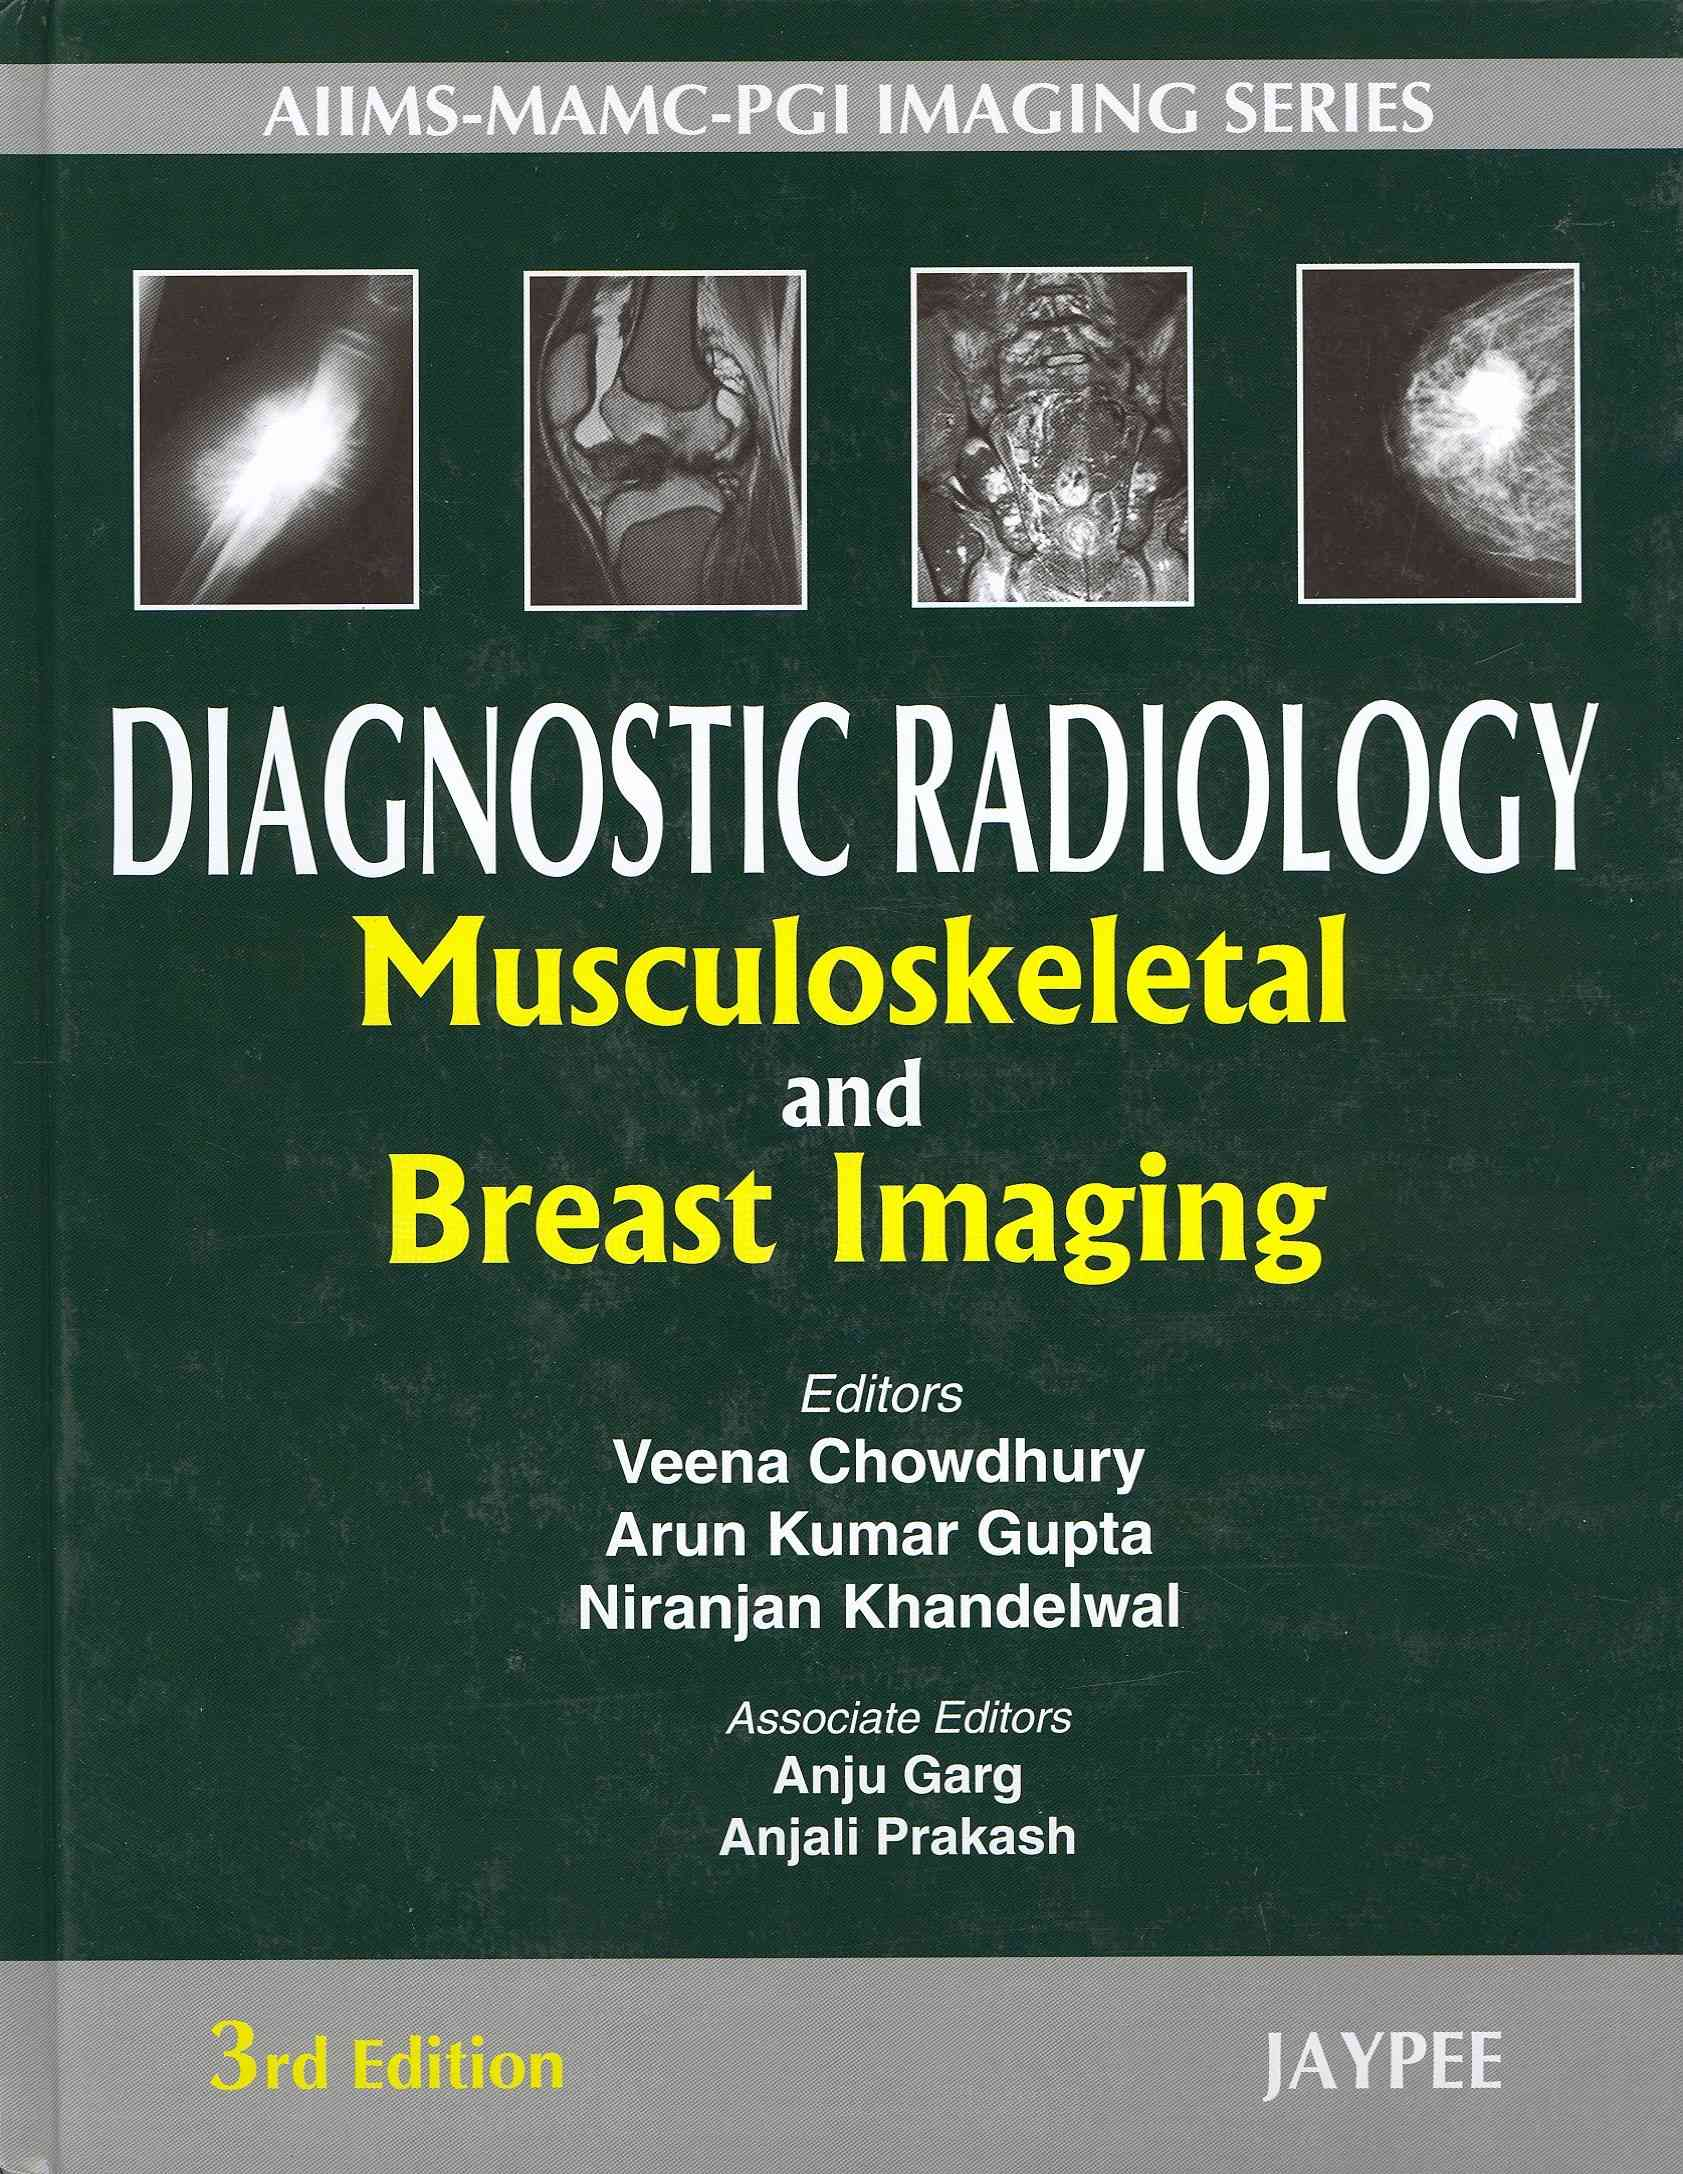 Diagnostic Radiology By Chowdhury, Veena/ Gupta, Arun Kumar/ Khandelwal, Niranjan